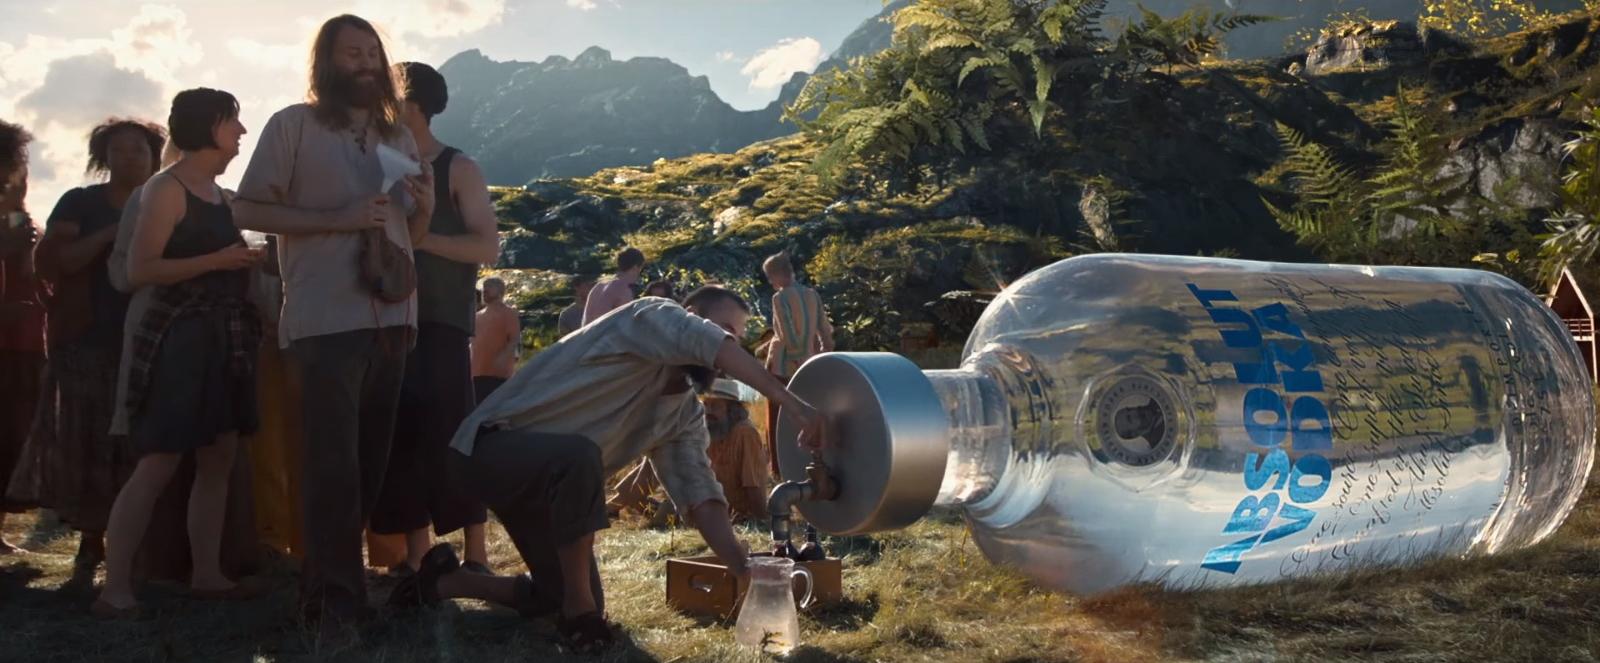 absolut vodka bottles in downsizing 2017 movie